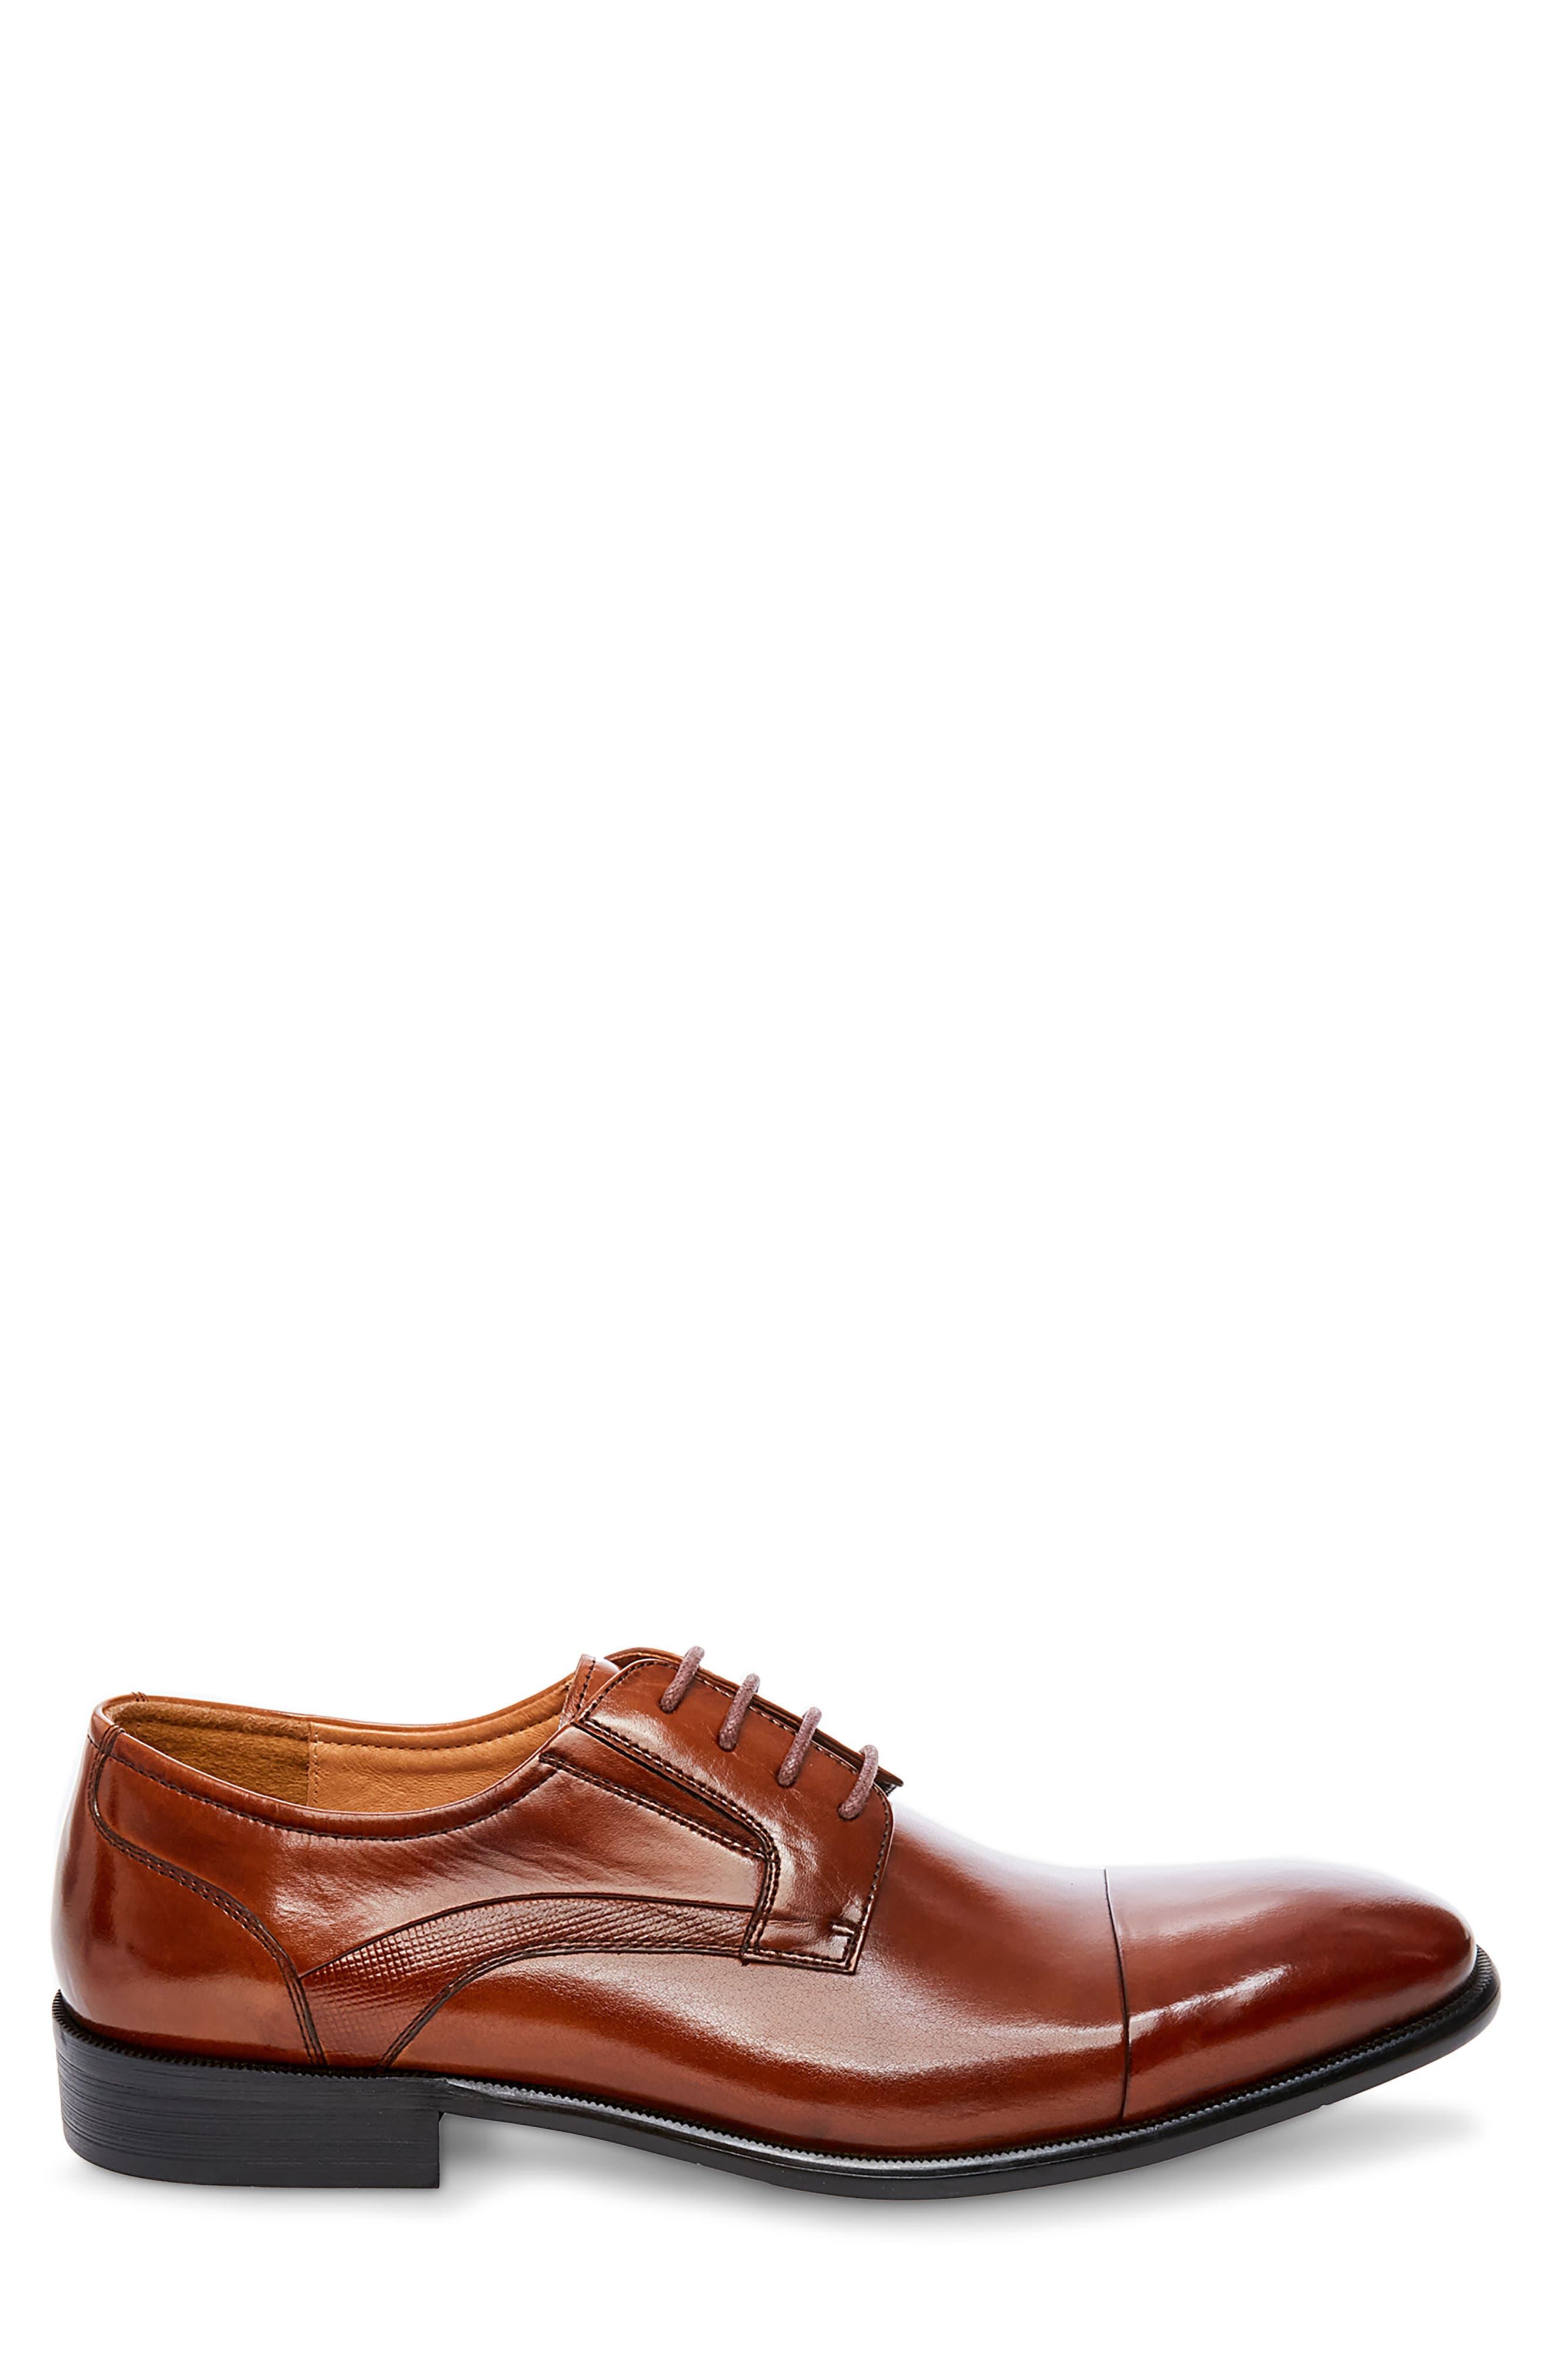 Carlo Cap Toe Derby,                             Alternate thumbnail 3, color,                             Tan Leather